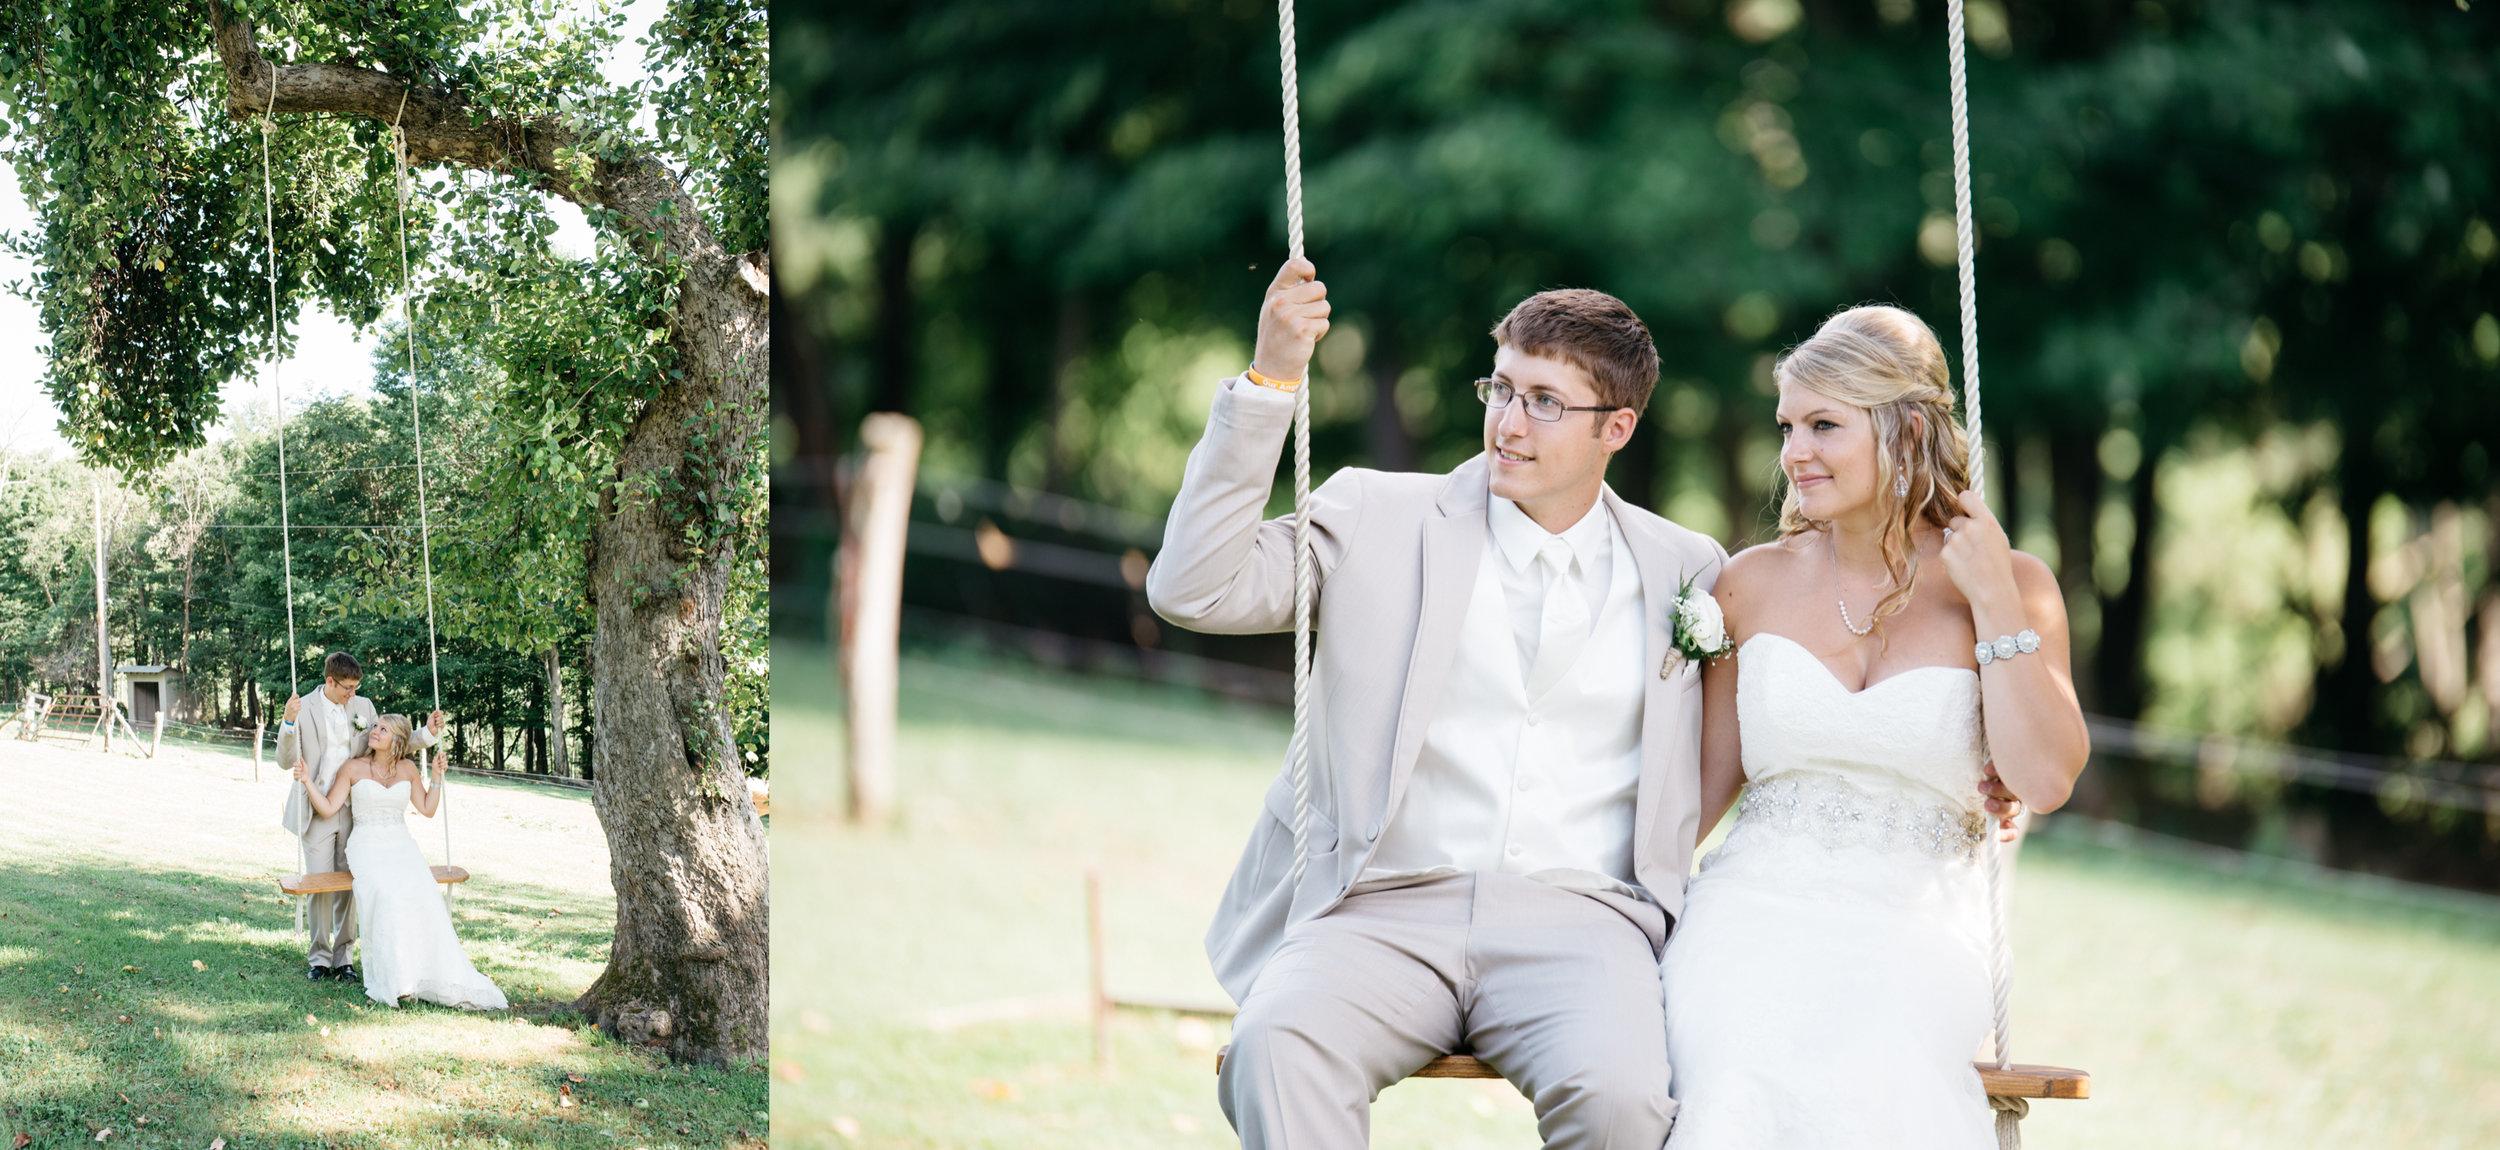 wedding photographs mariah fisher.jpg